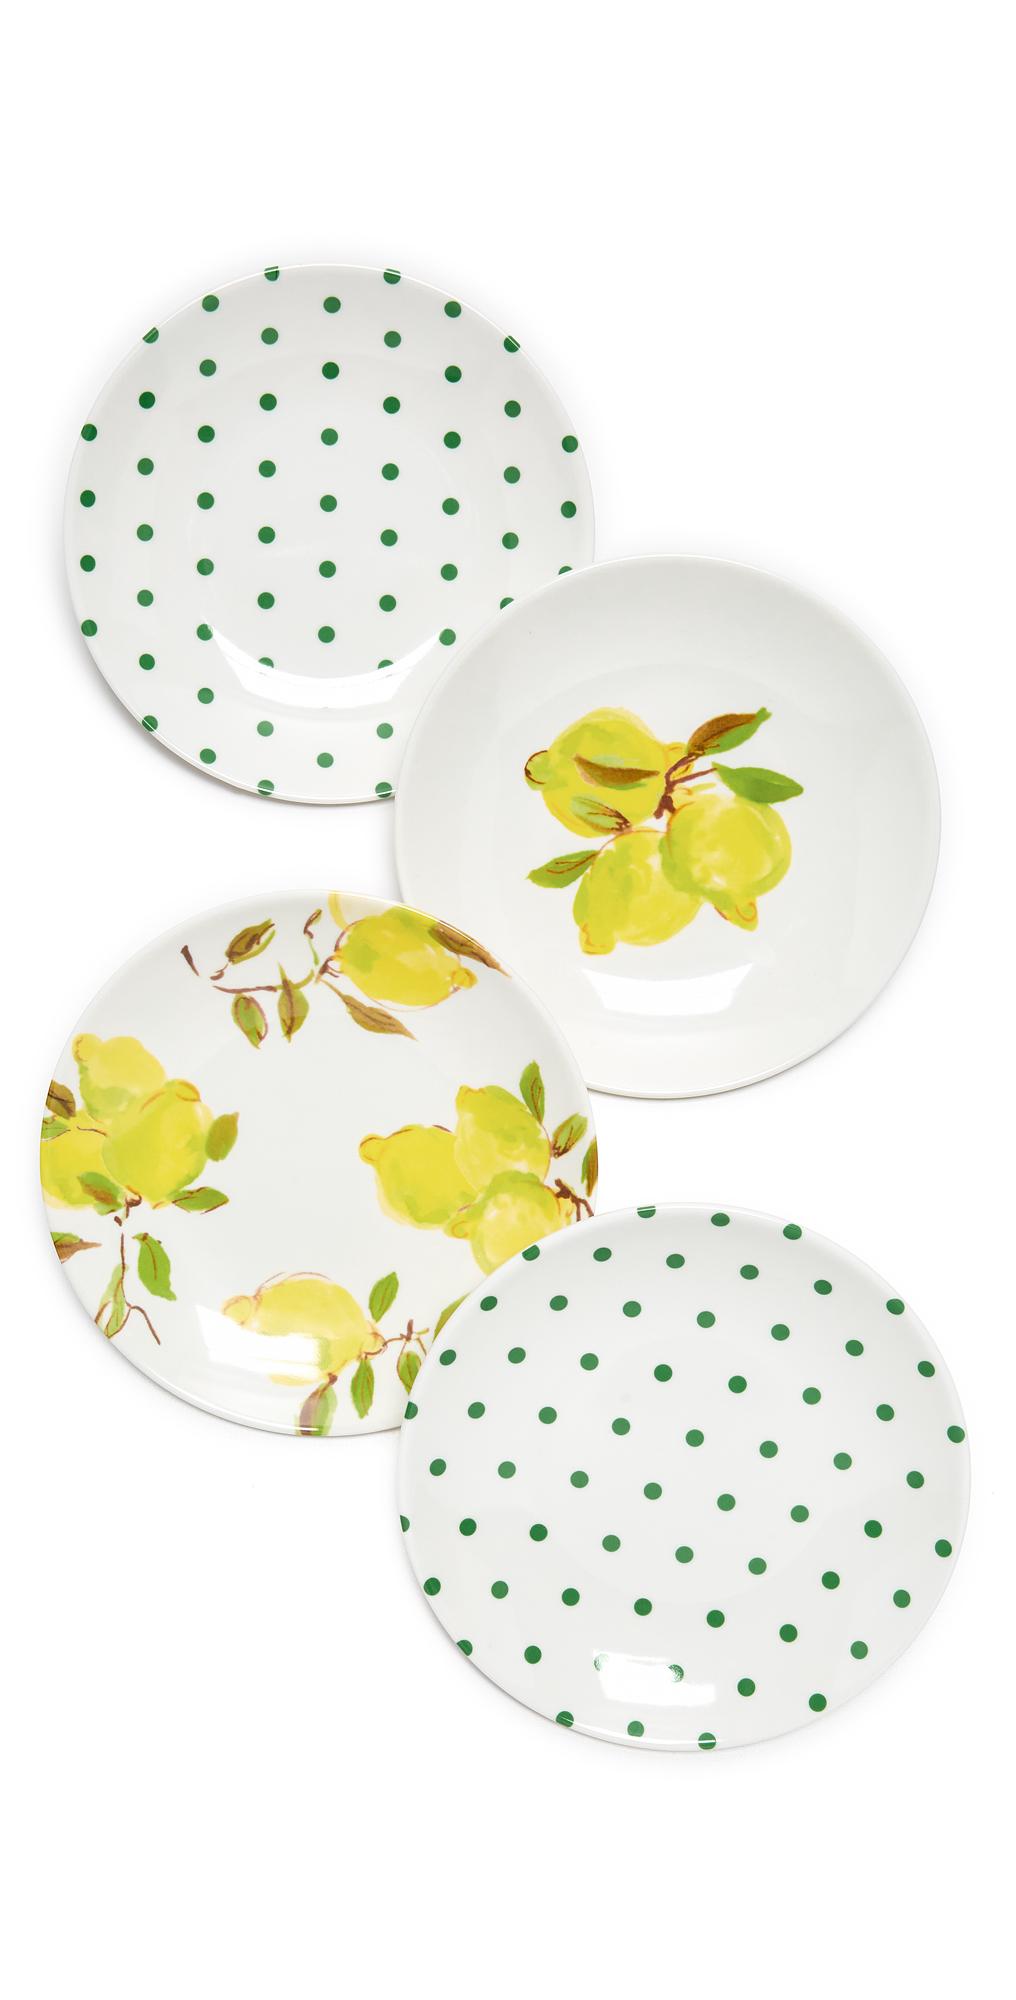 Lemon Melamine Tidbit Plates Kate Spade New York